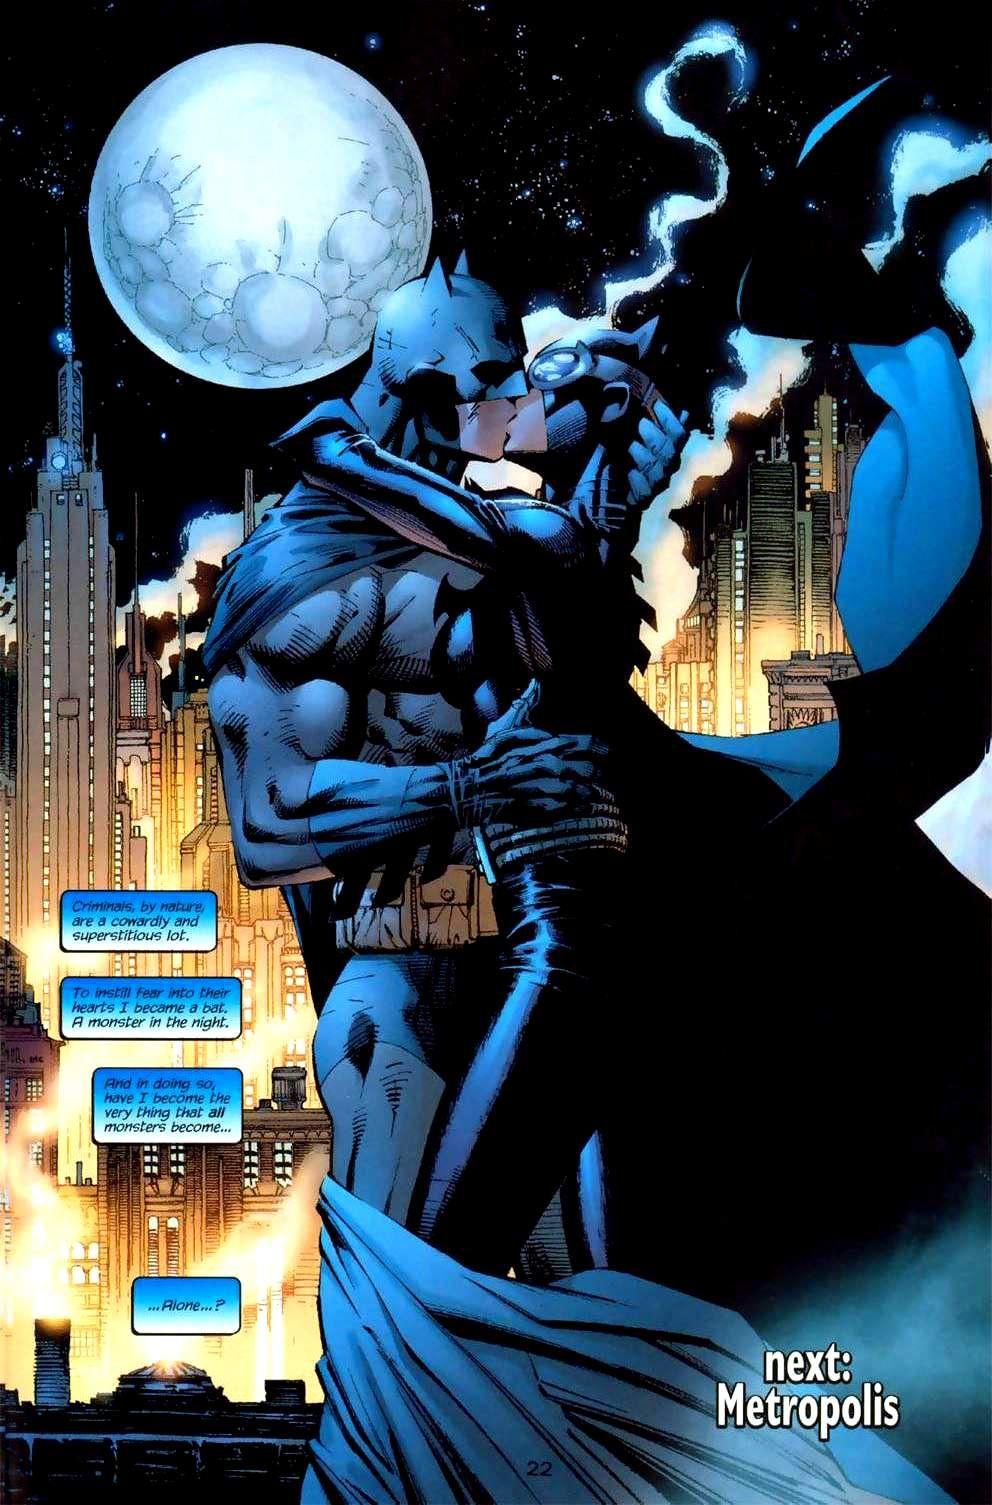 batman catwoman good night - Buscar con Google